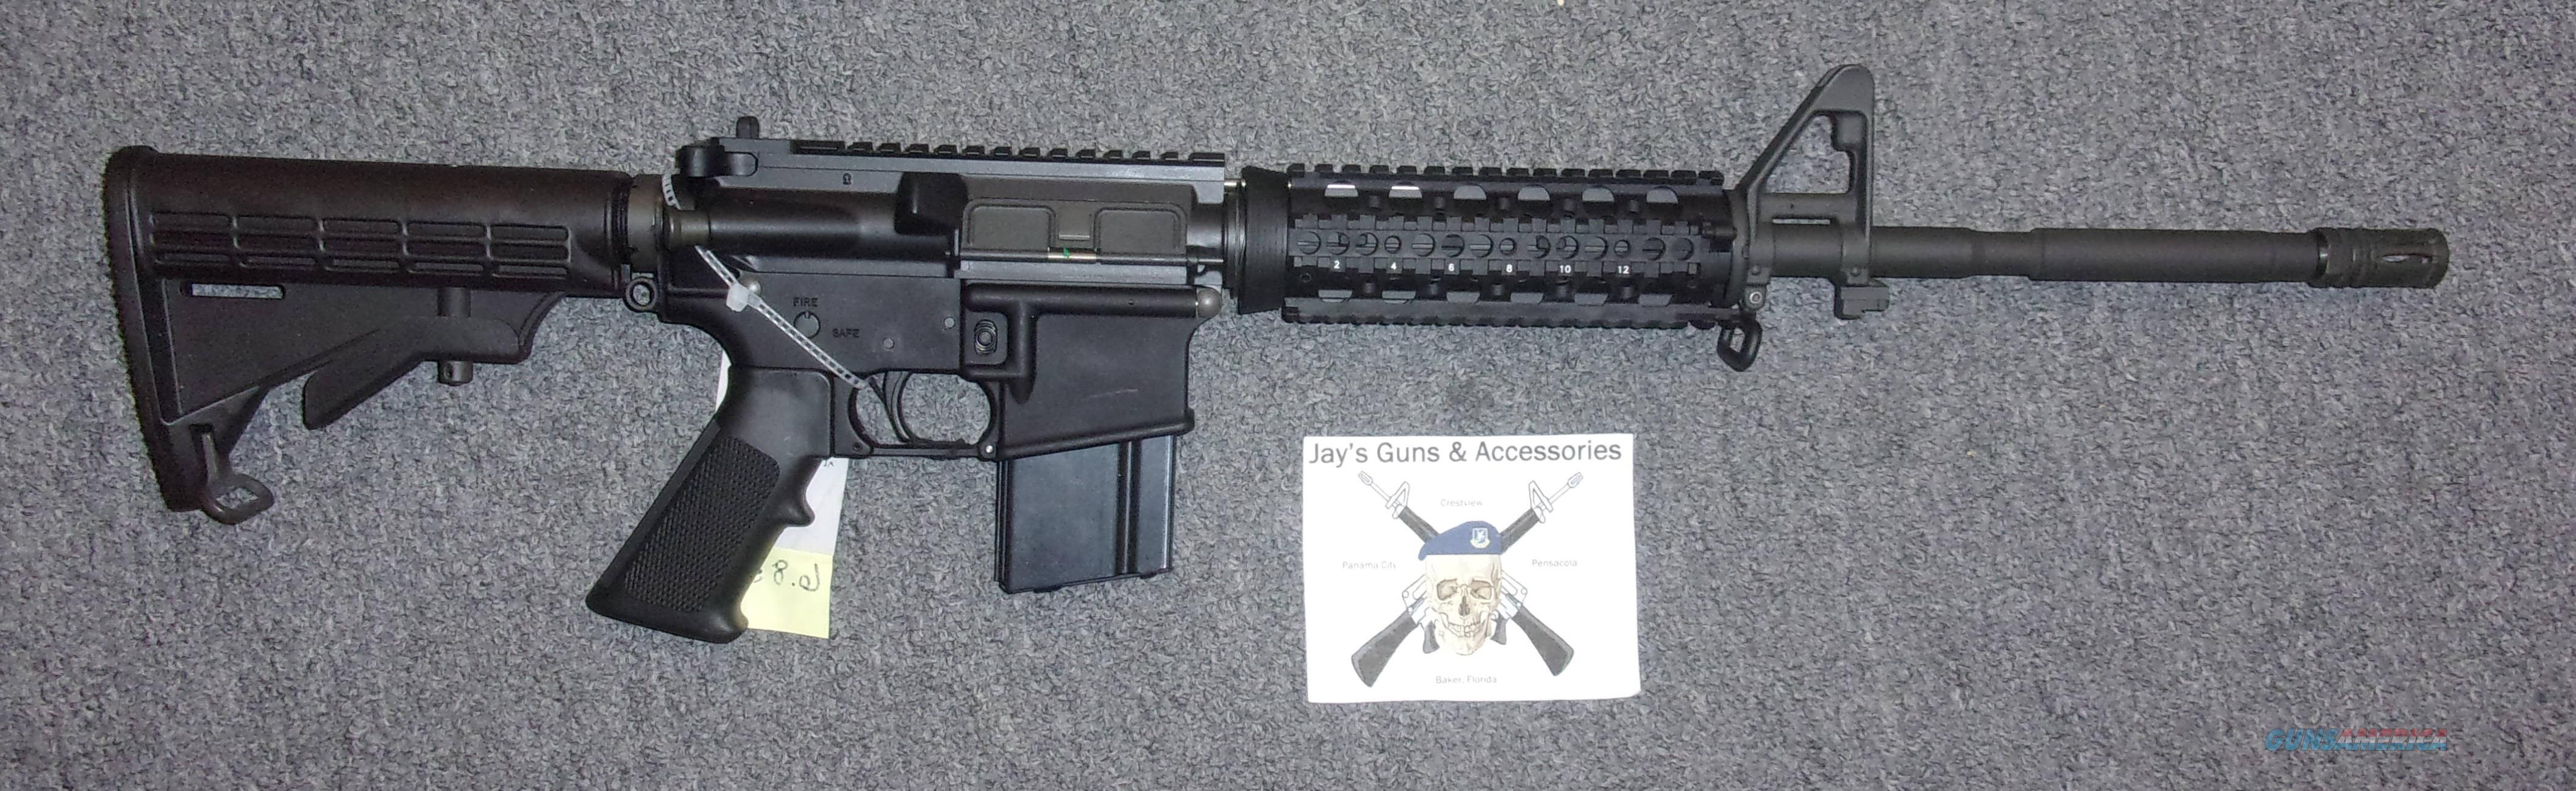 Rock River Arms LAR-15 in 6.8 SPC  Guns > Rifles > Rock River Arms Rifles